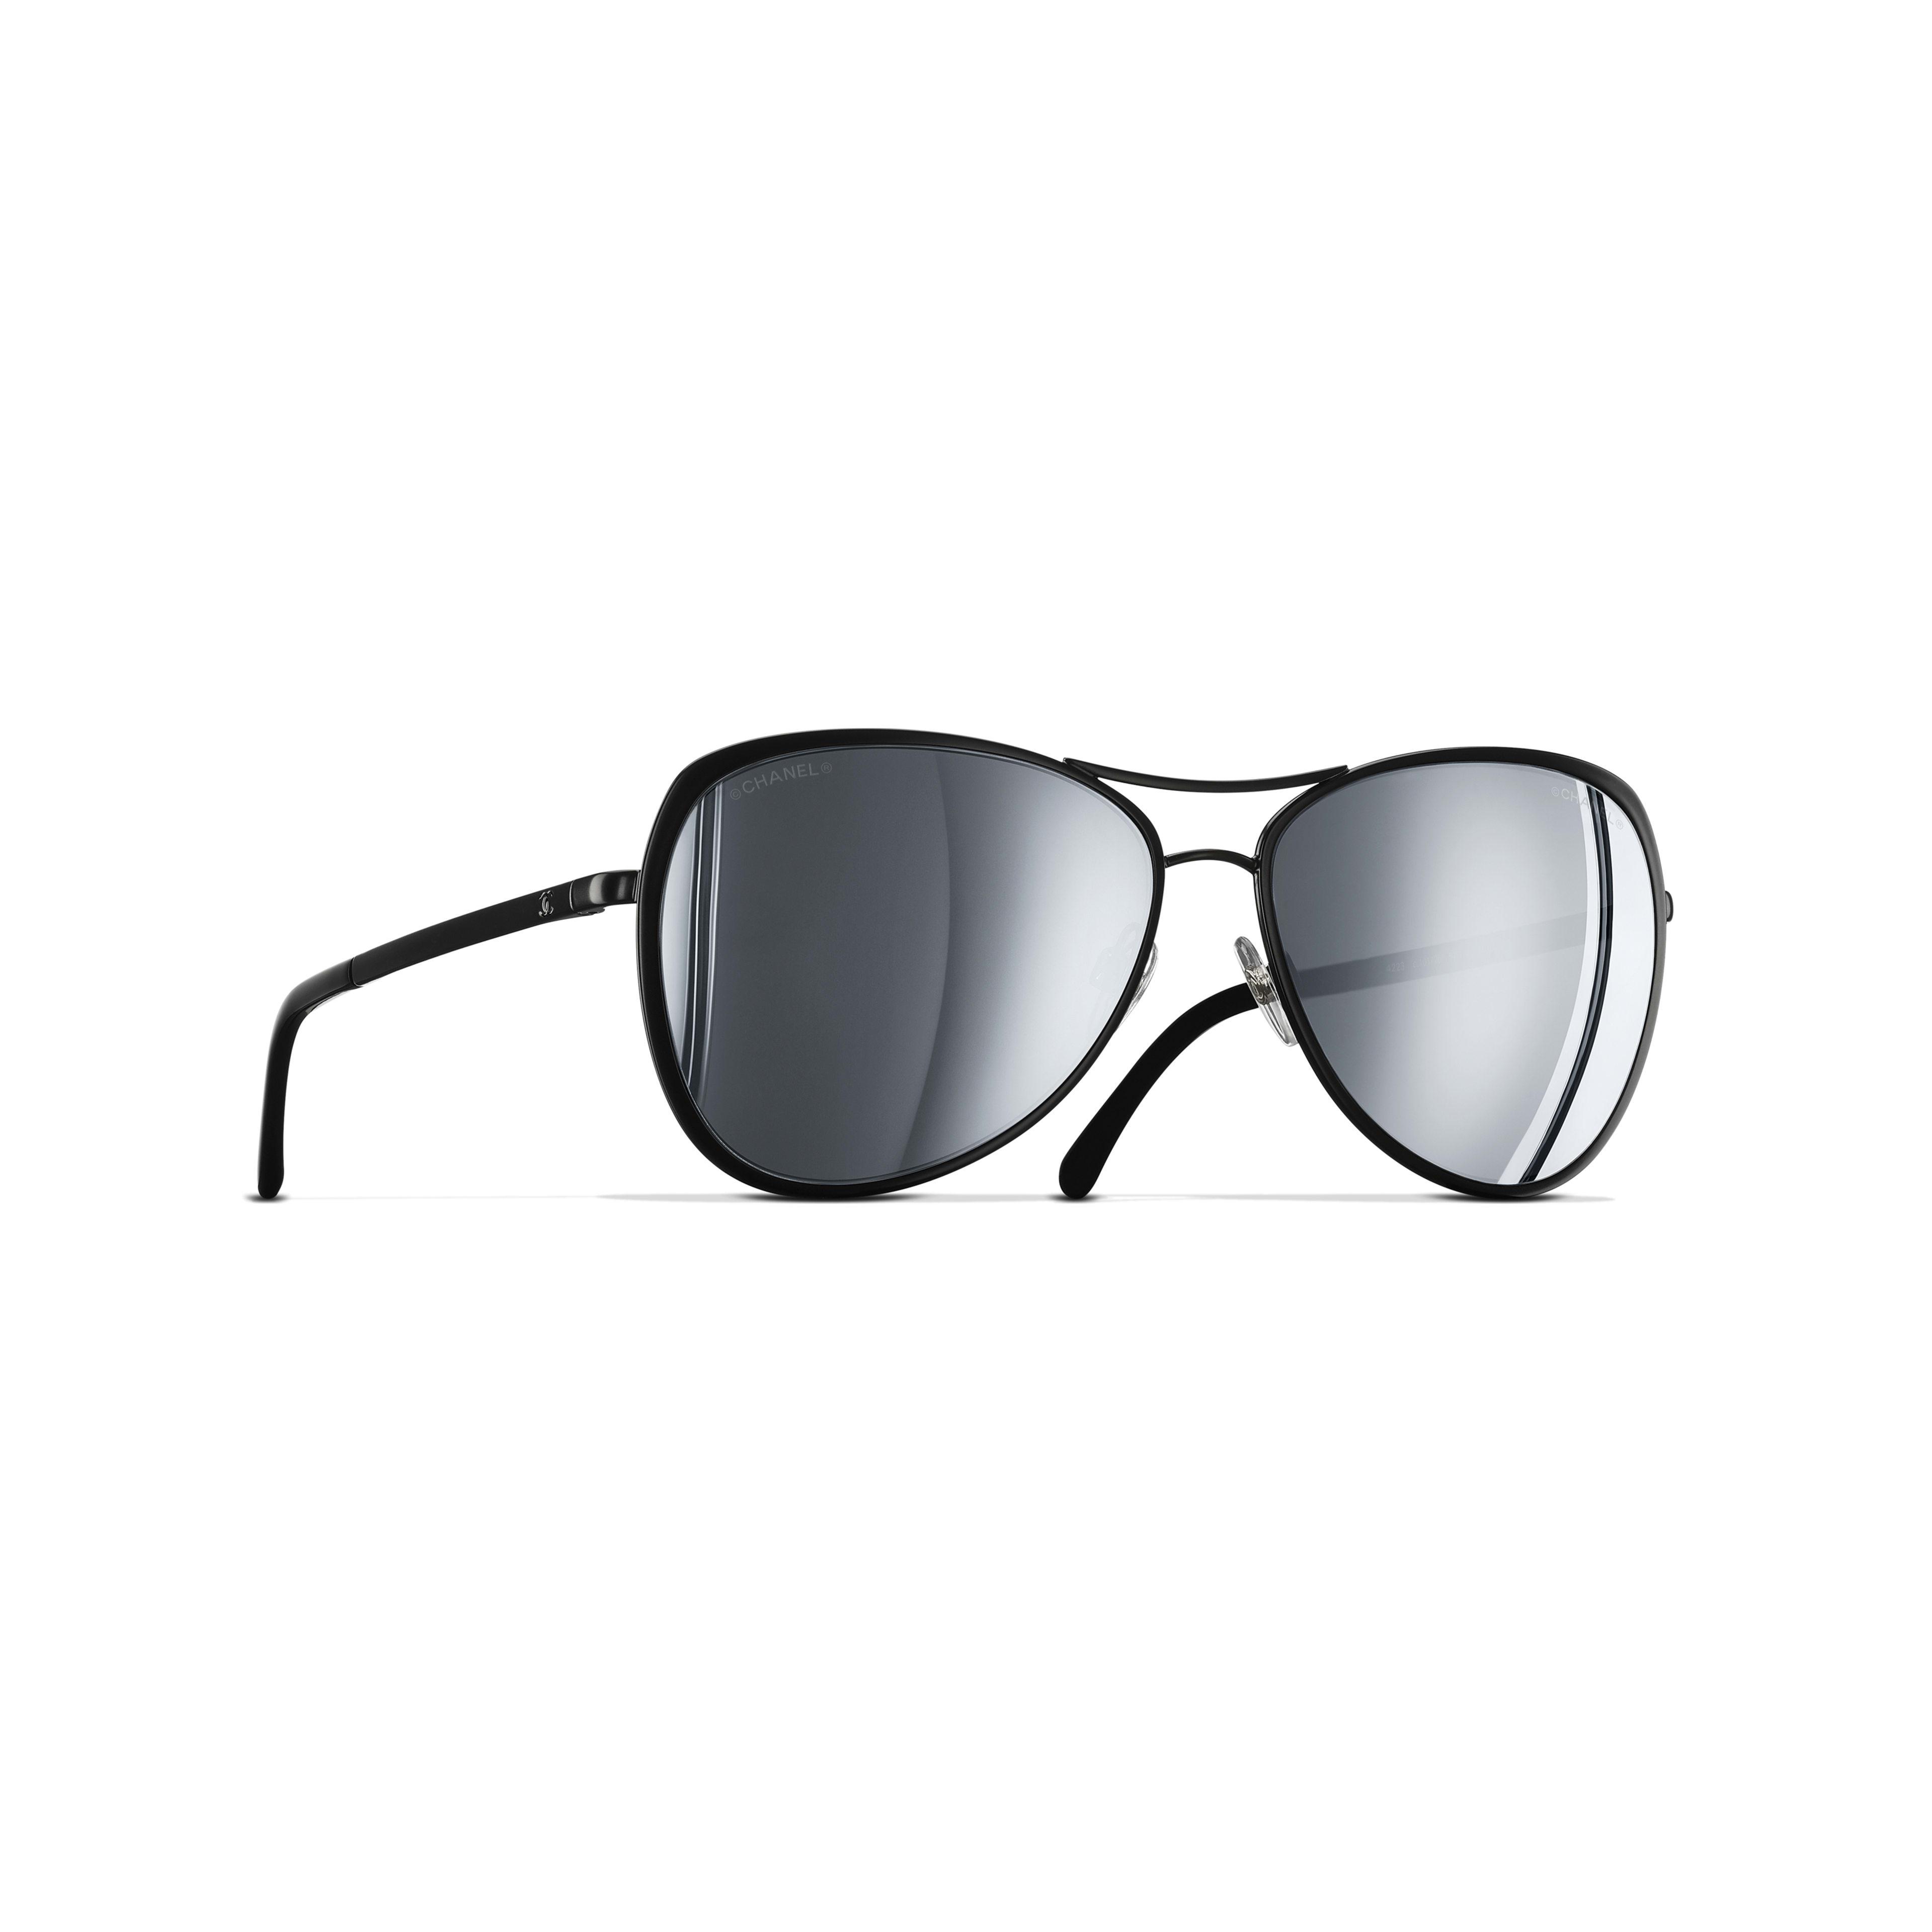 Pilot Sunglasses Metal Black -                                               view 1 - see full sized version